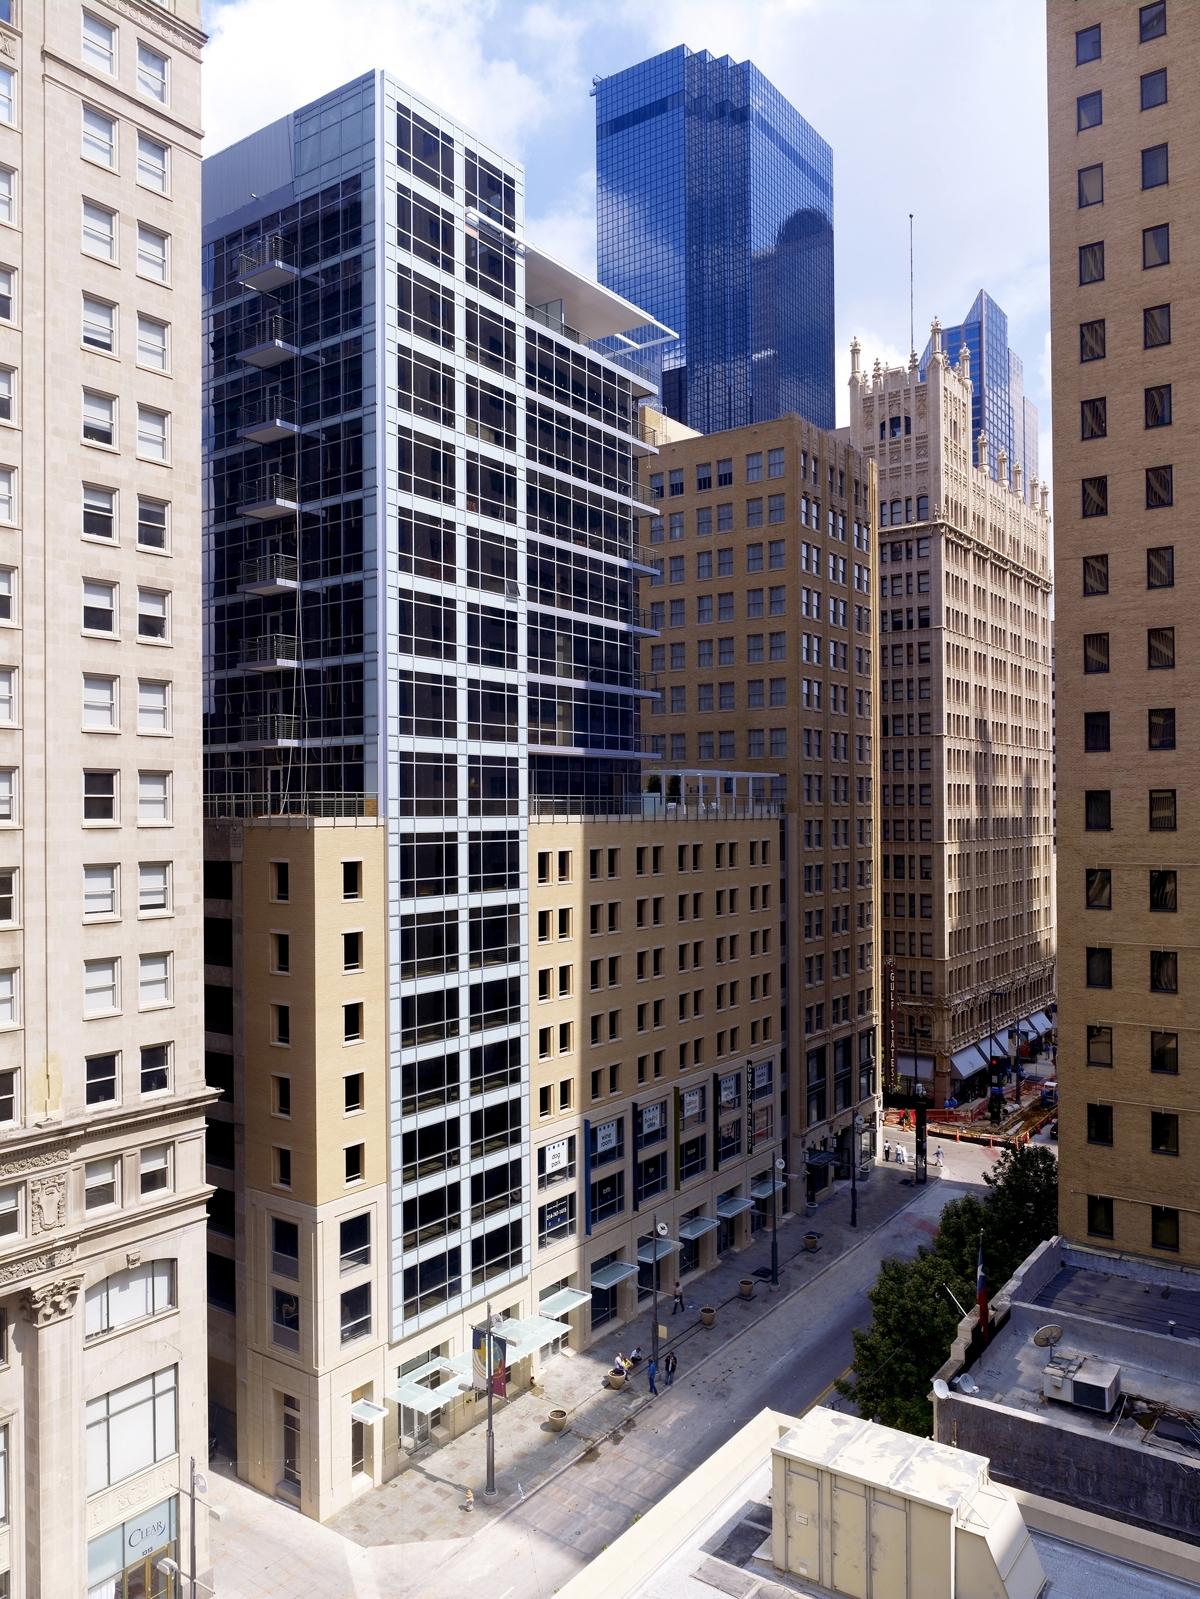 Dallas Real Estate For Rent Dallas Apartments For Rent